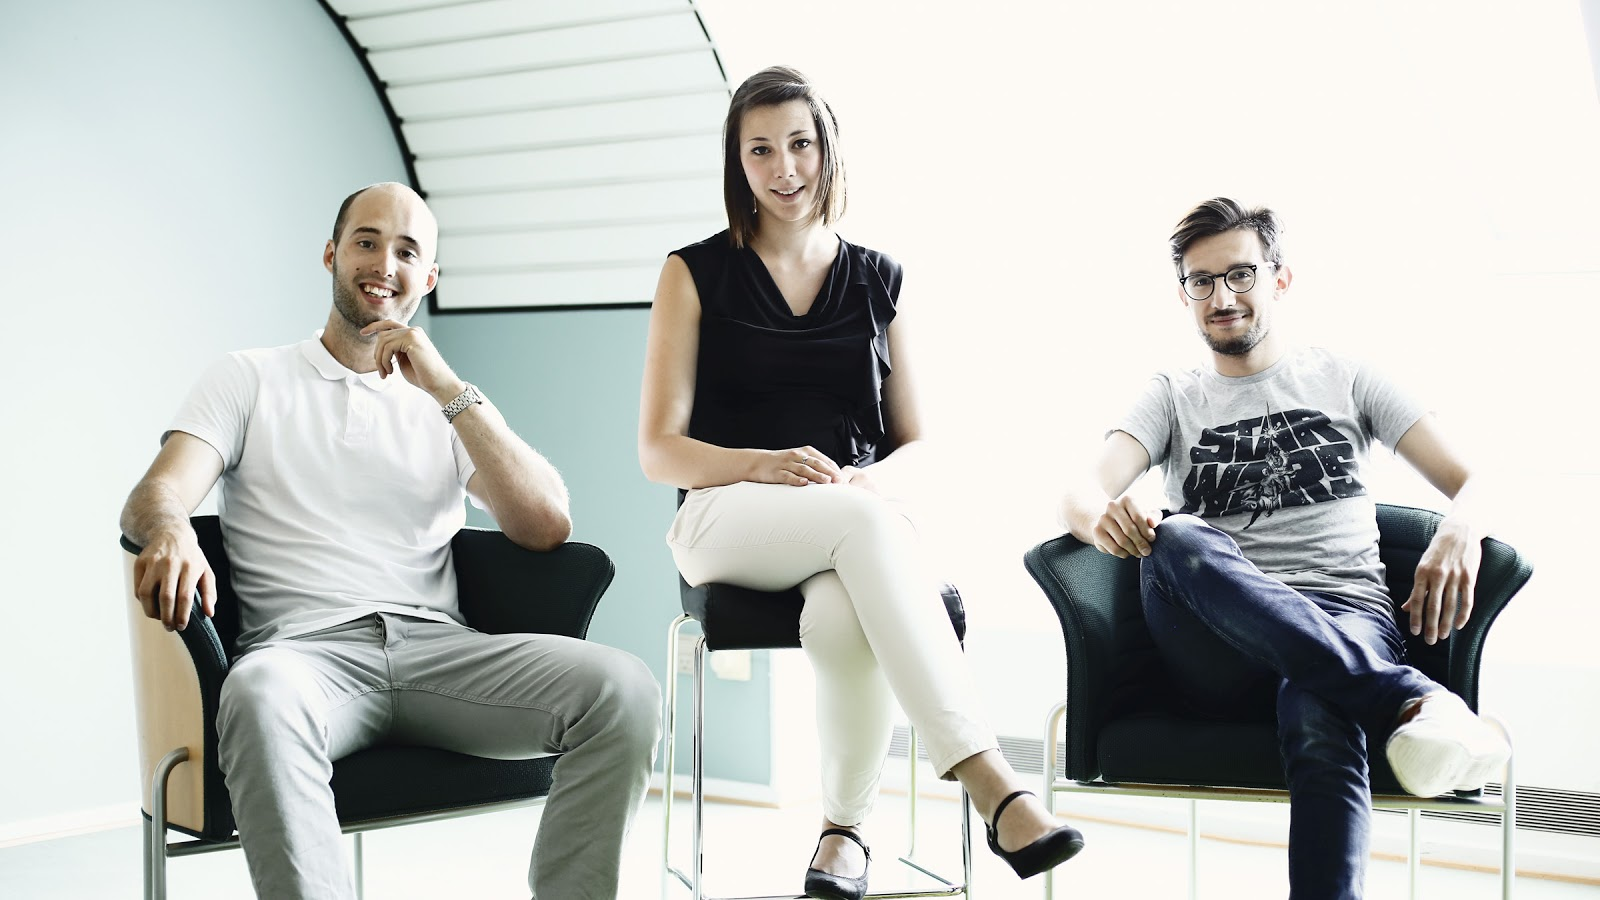 Kasper, Yana and Stefan at Denmark